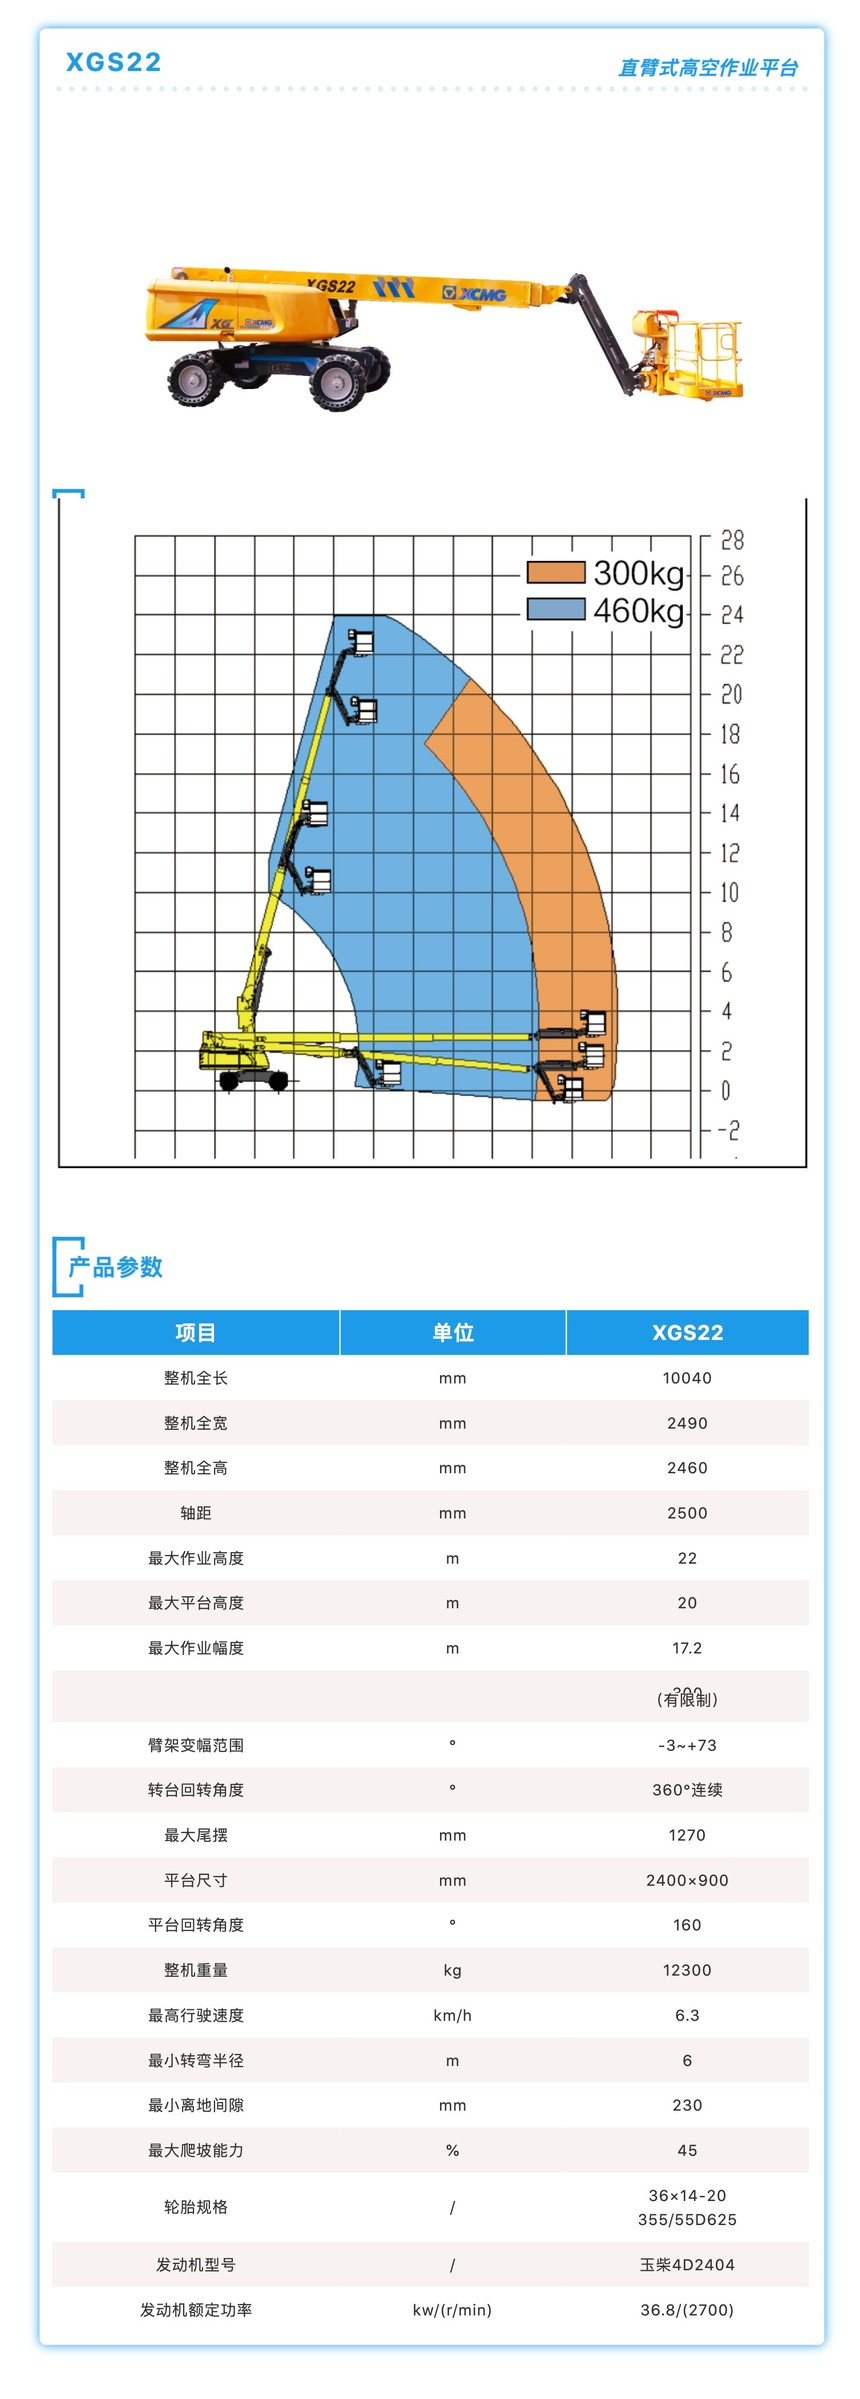 FireShot Capture 006 - XGS22直臂式高空作业平台 - mp.weixin.qq.com.jpg